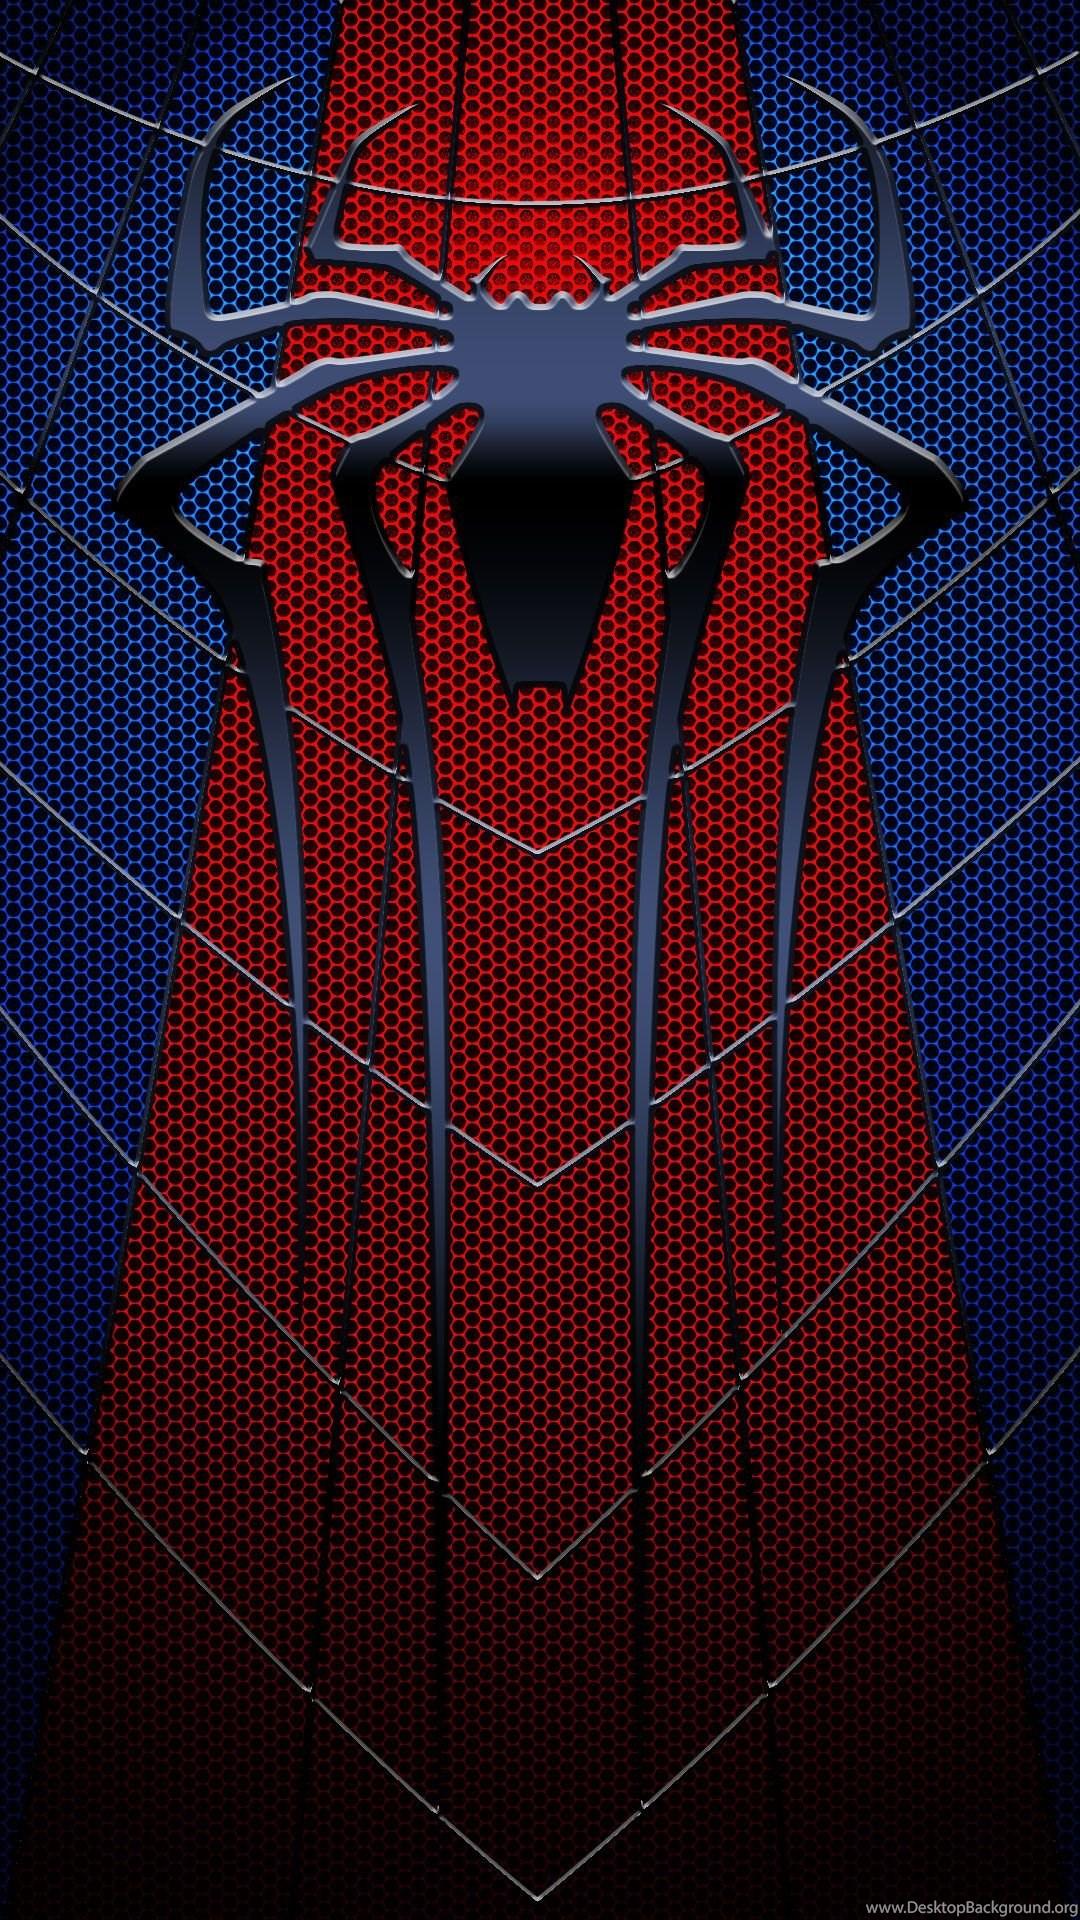 Spiderman Phone Wallpapers By Balsavor On Deviantart Desktop Background